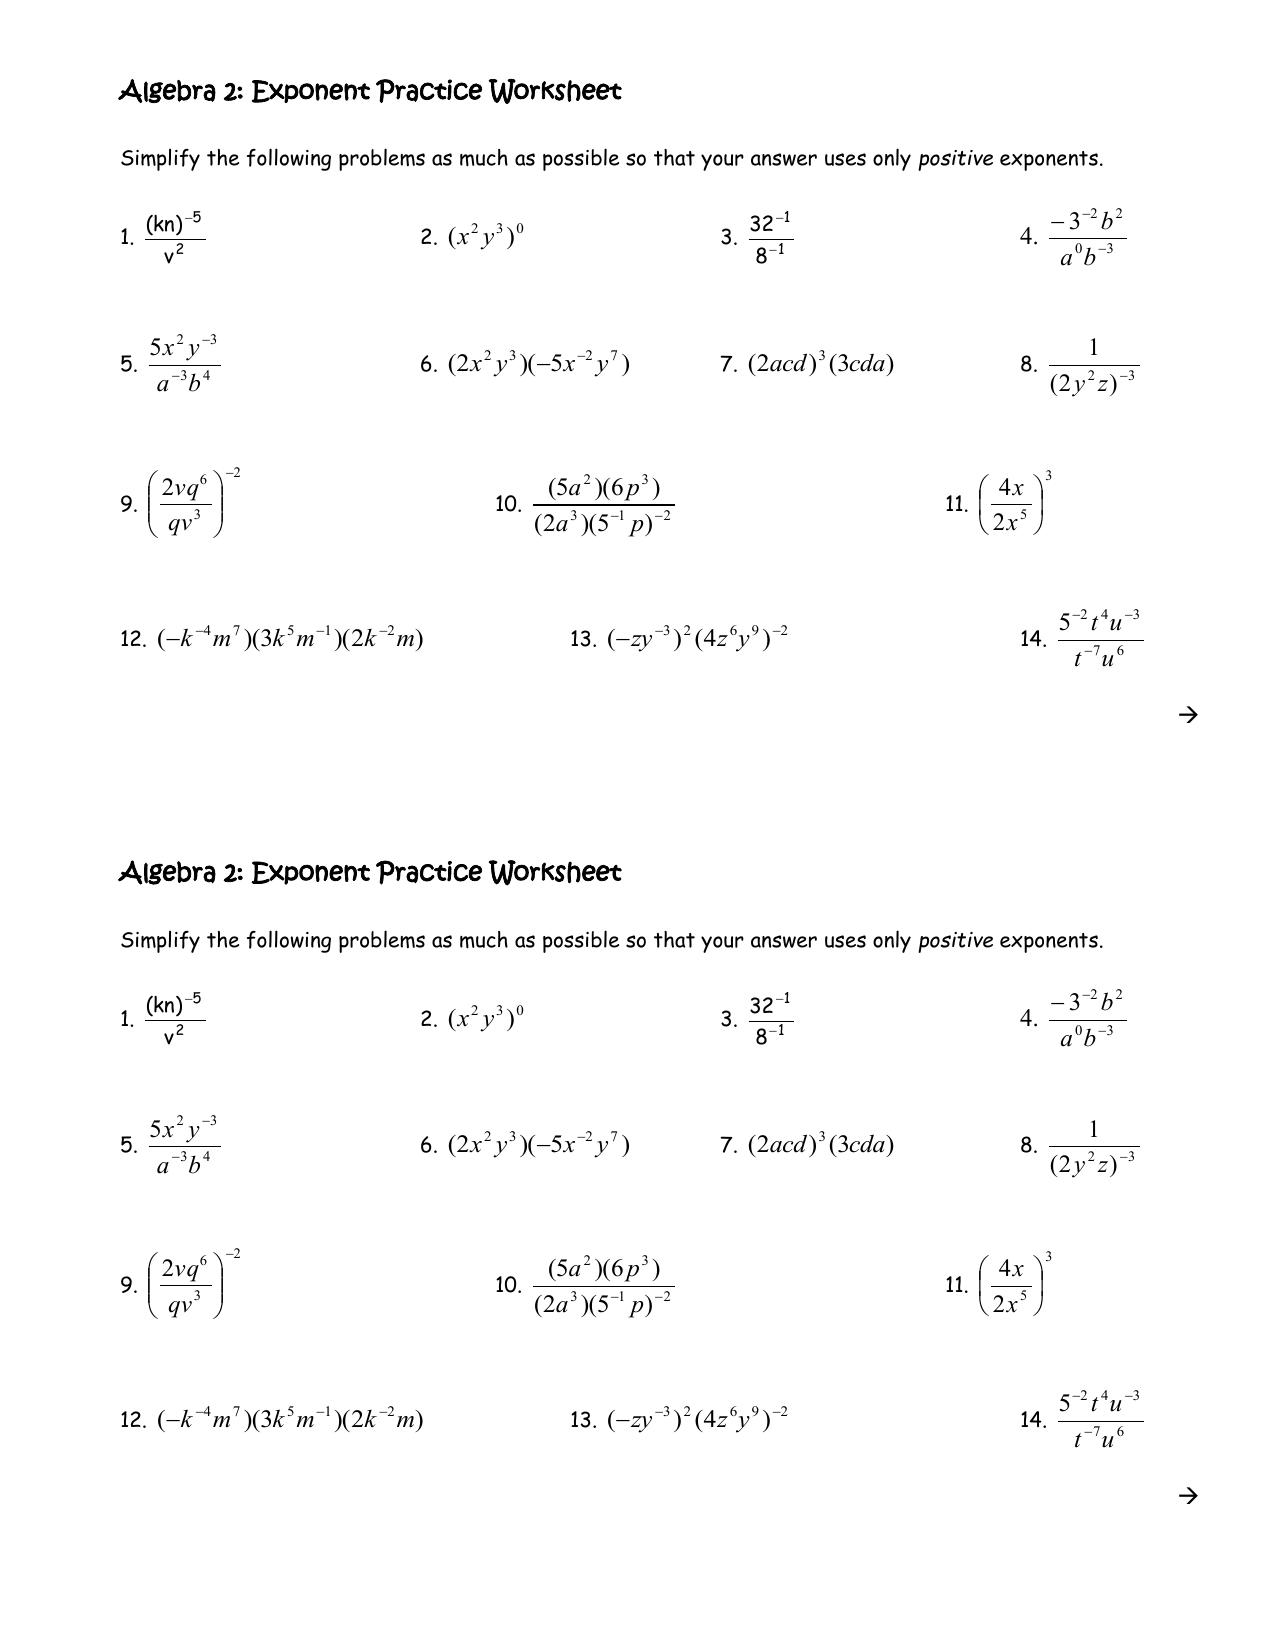 Algebra 2: Exponent Practice Worksheet